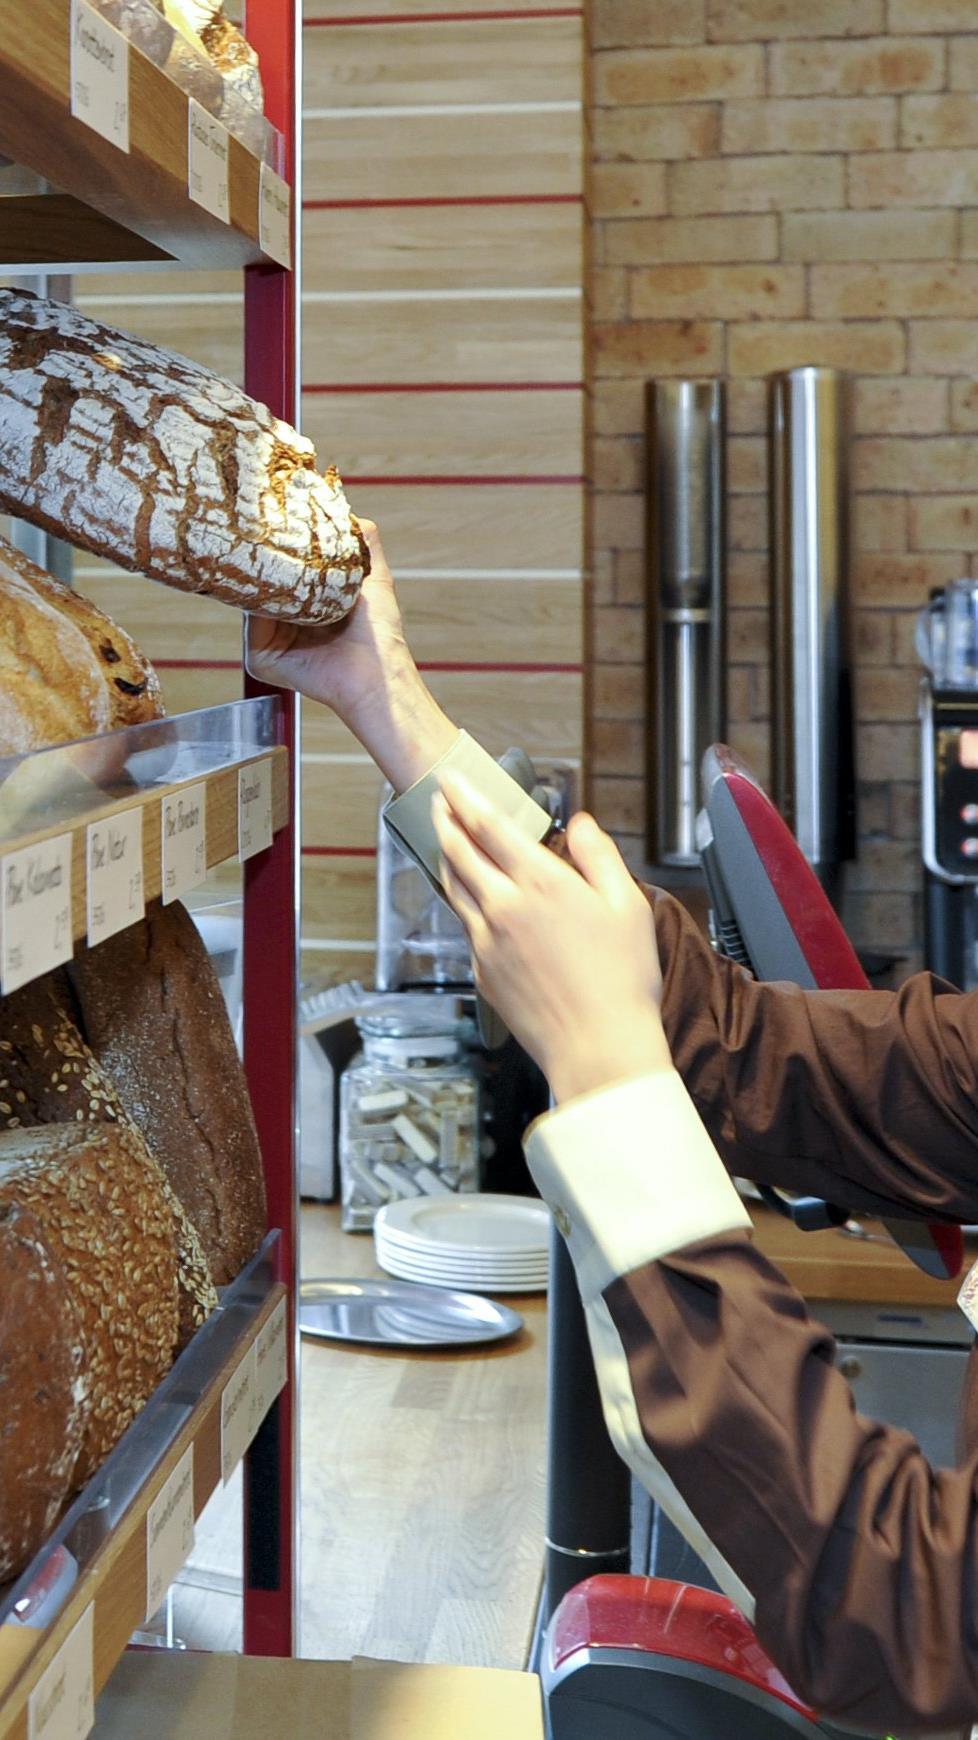 / Wiener Traditionsbäcker gehört seit kurzem Grossnigg und Ölz